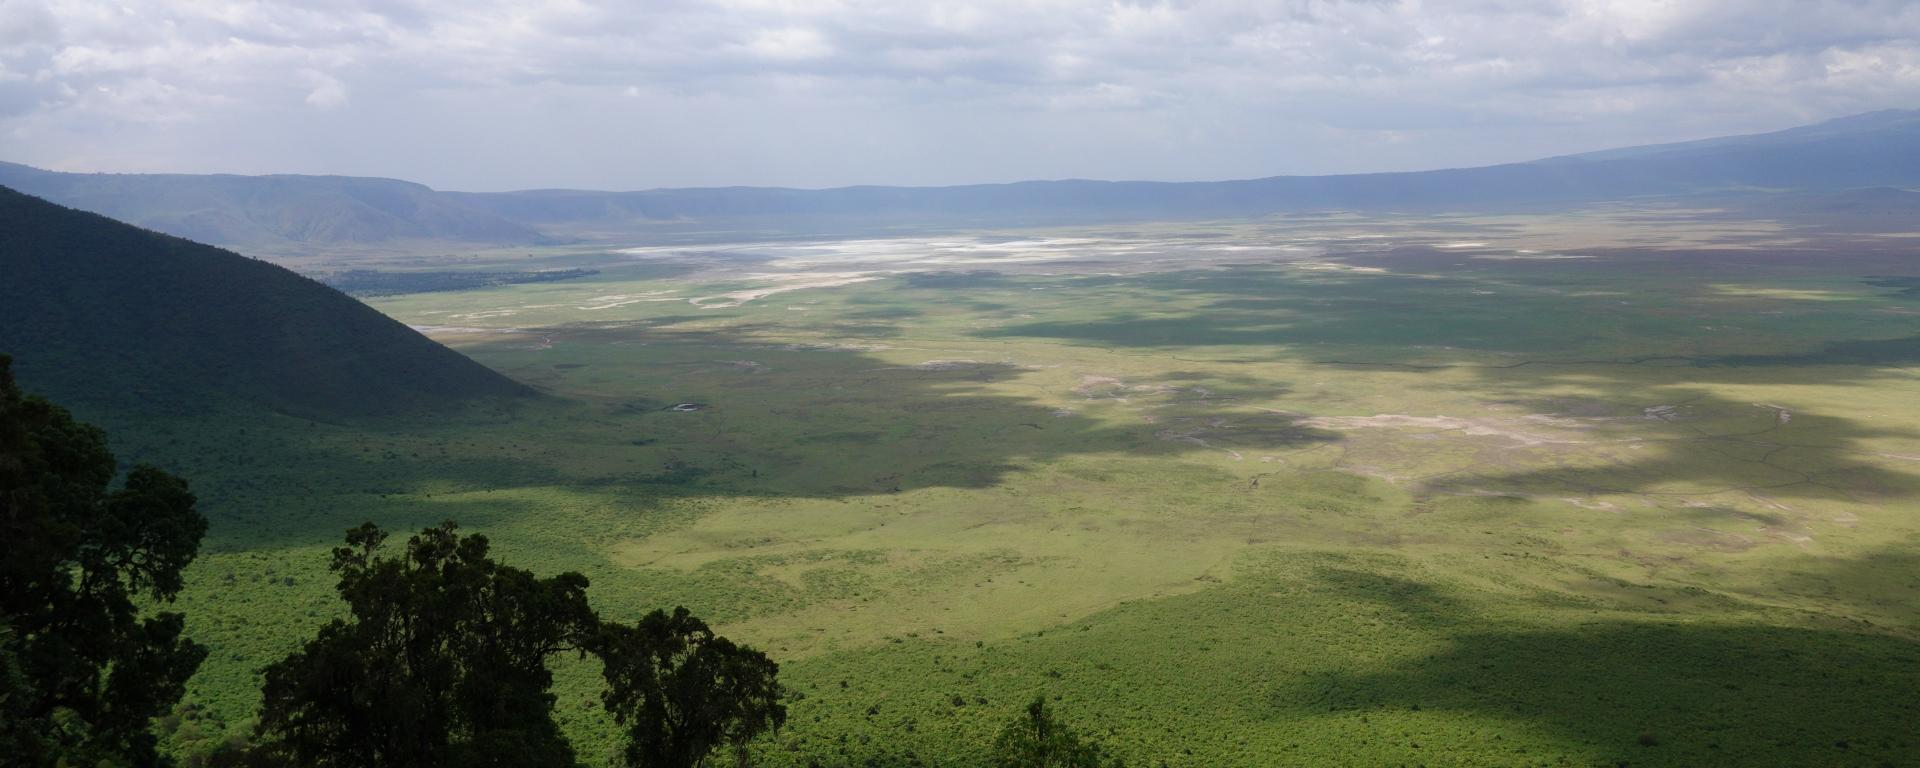 Ngorongoro_Crater_Go2Africa_banner2